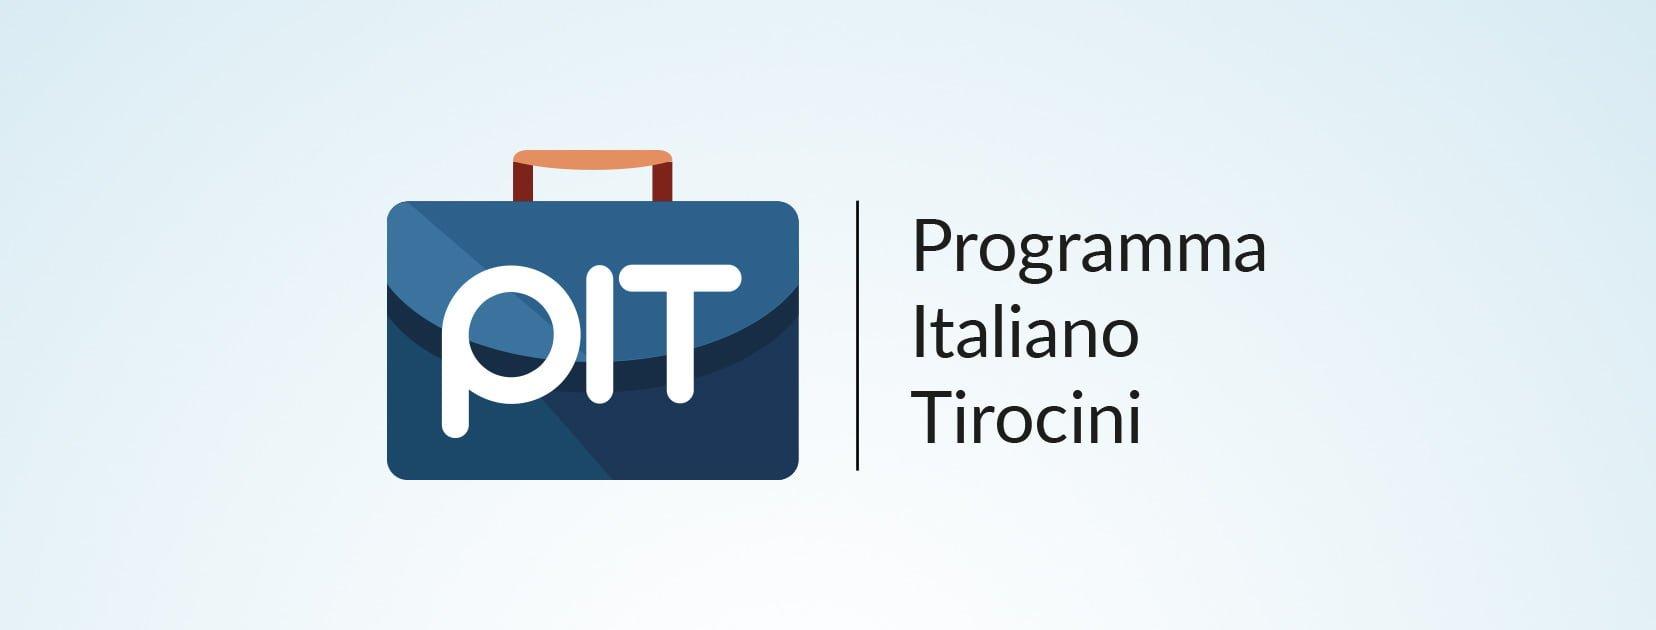 Programma Italiano Tirocini (PIT) – Marzo 2020